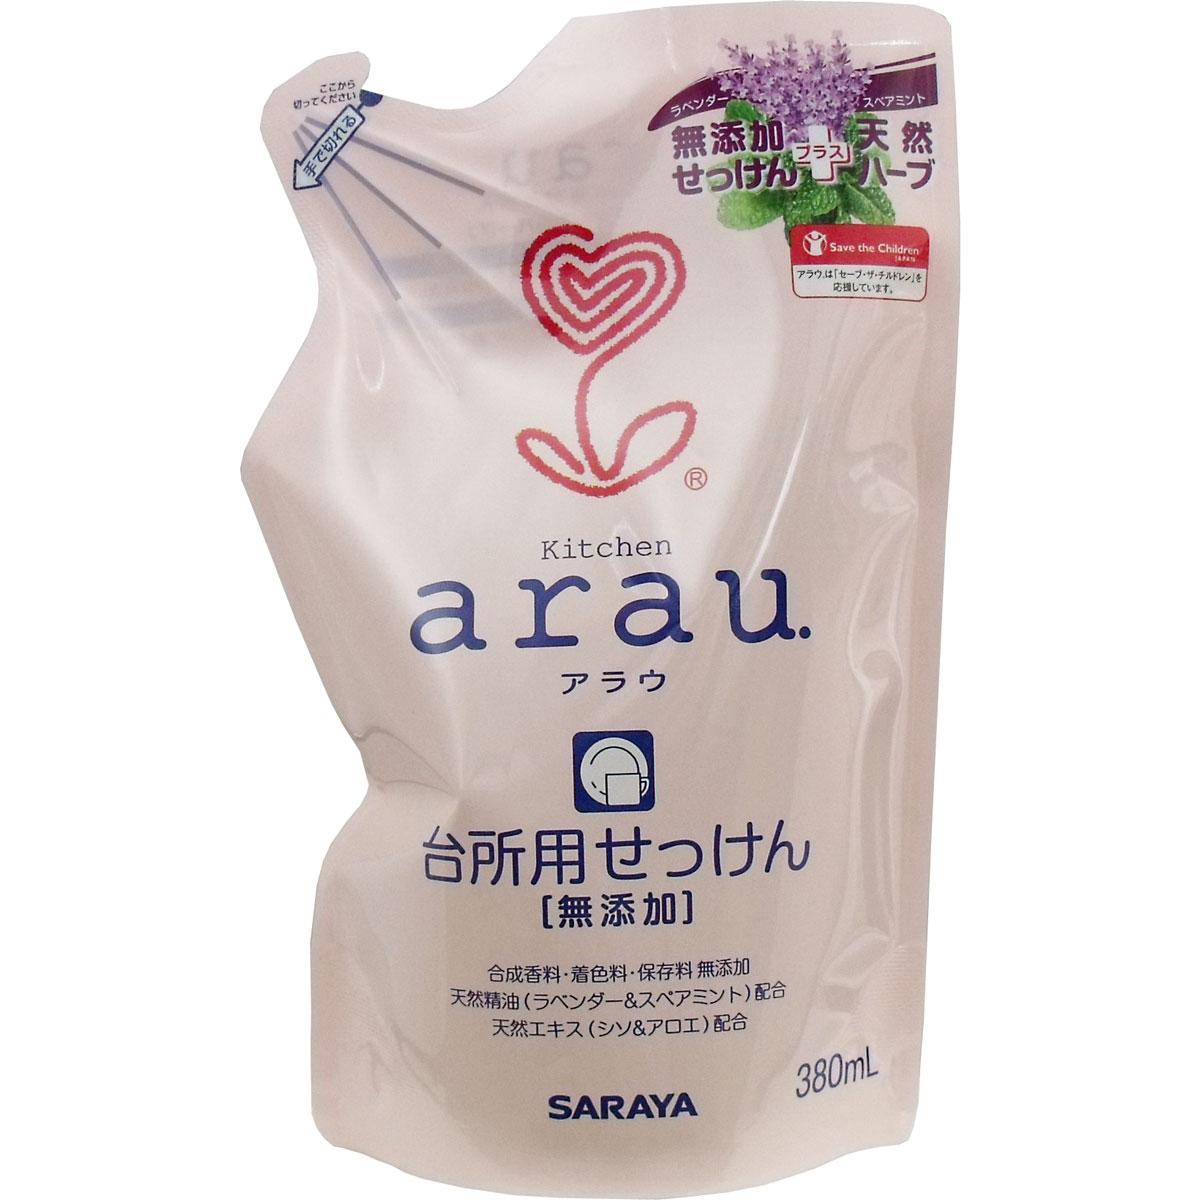 kitchen soap banquette bench himeji distribution center arau 厨房肥皂笔芯为380 毫升 现在 现在只膨胀